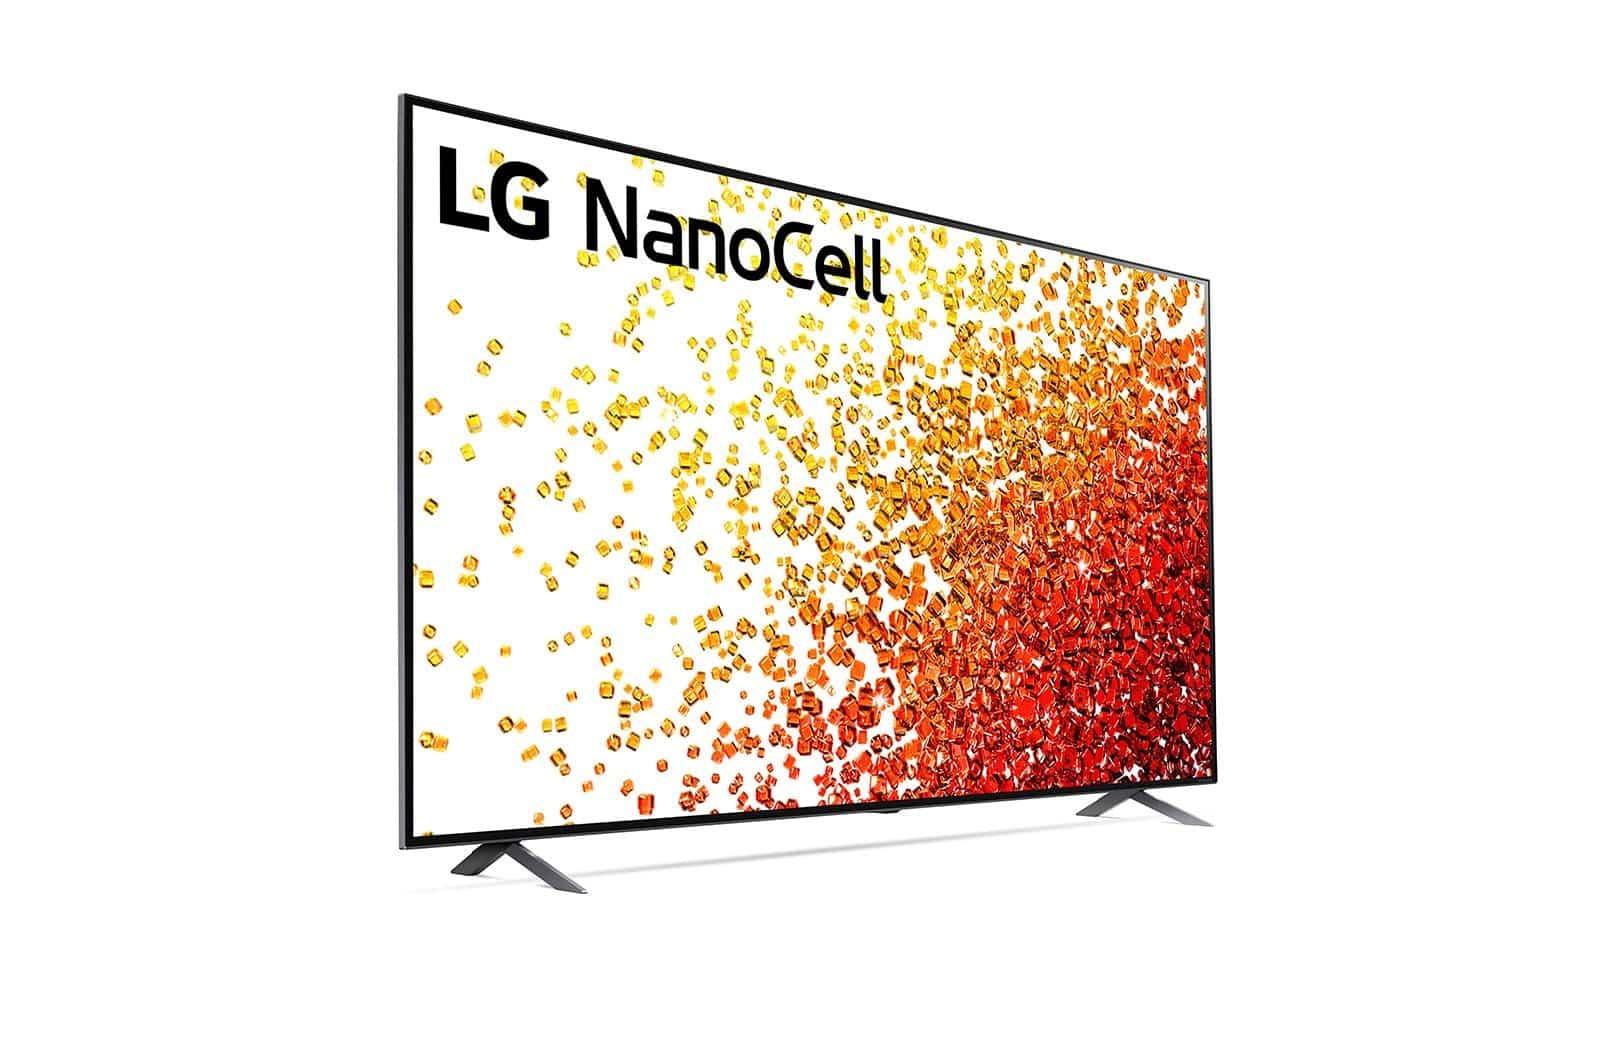 LG Nano 90 NanoCell 4K Téléviseur Intelligent de 86 po avec AI ThinQ (86NANO90UPA)